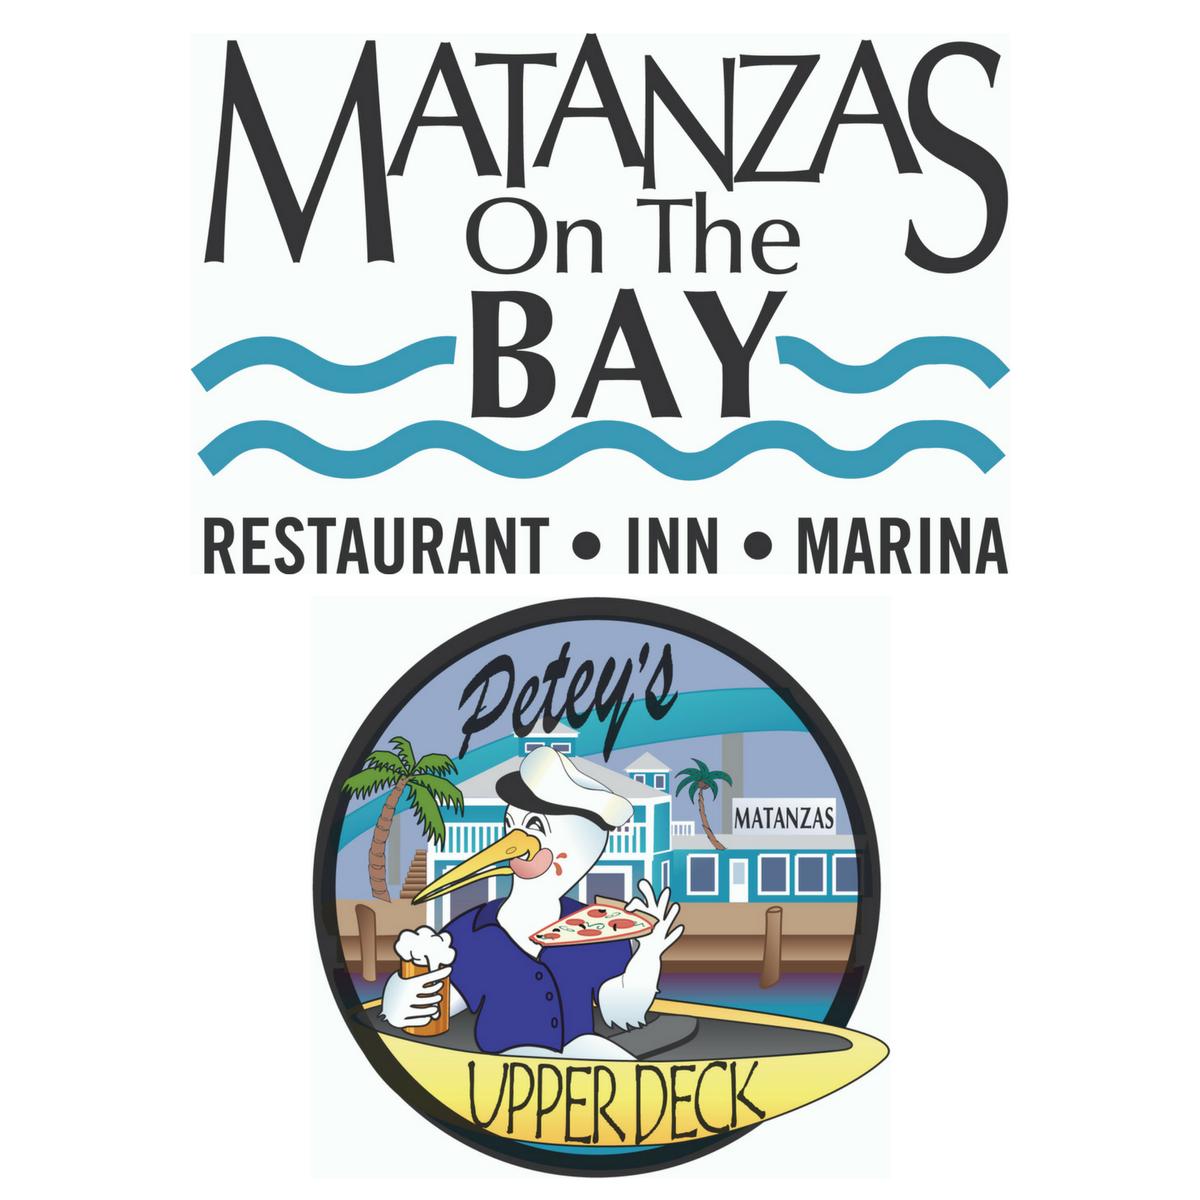 Matanzas on the Bay image 6